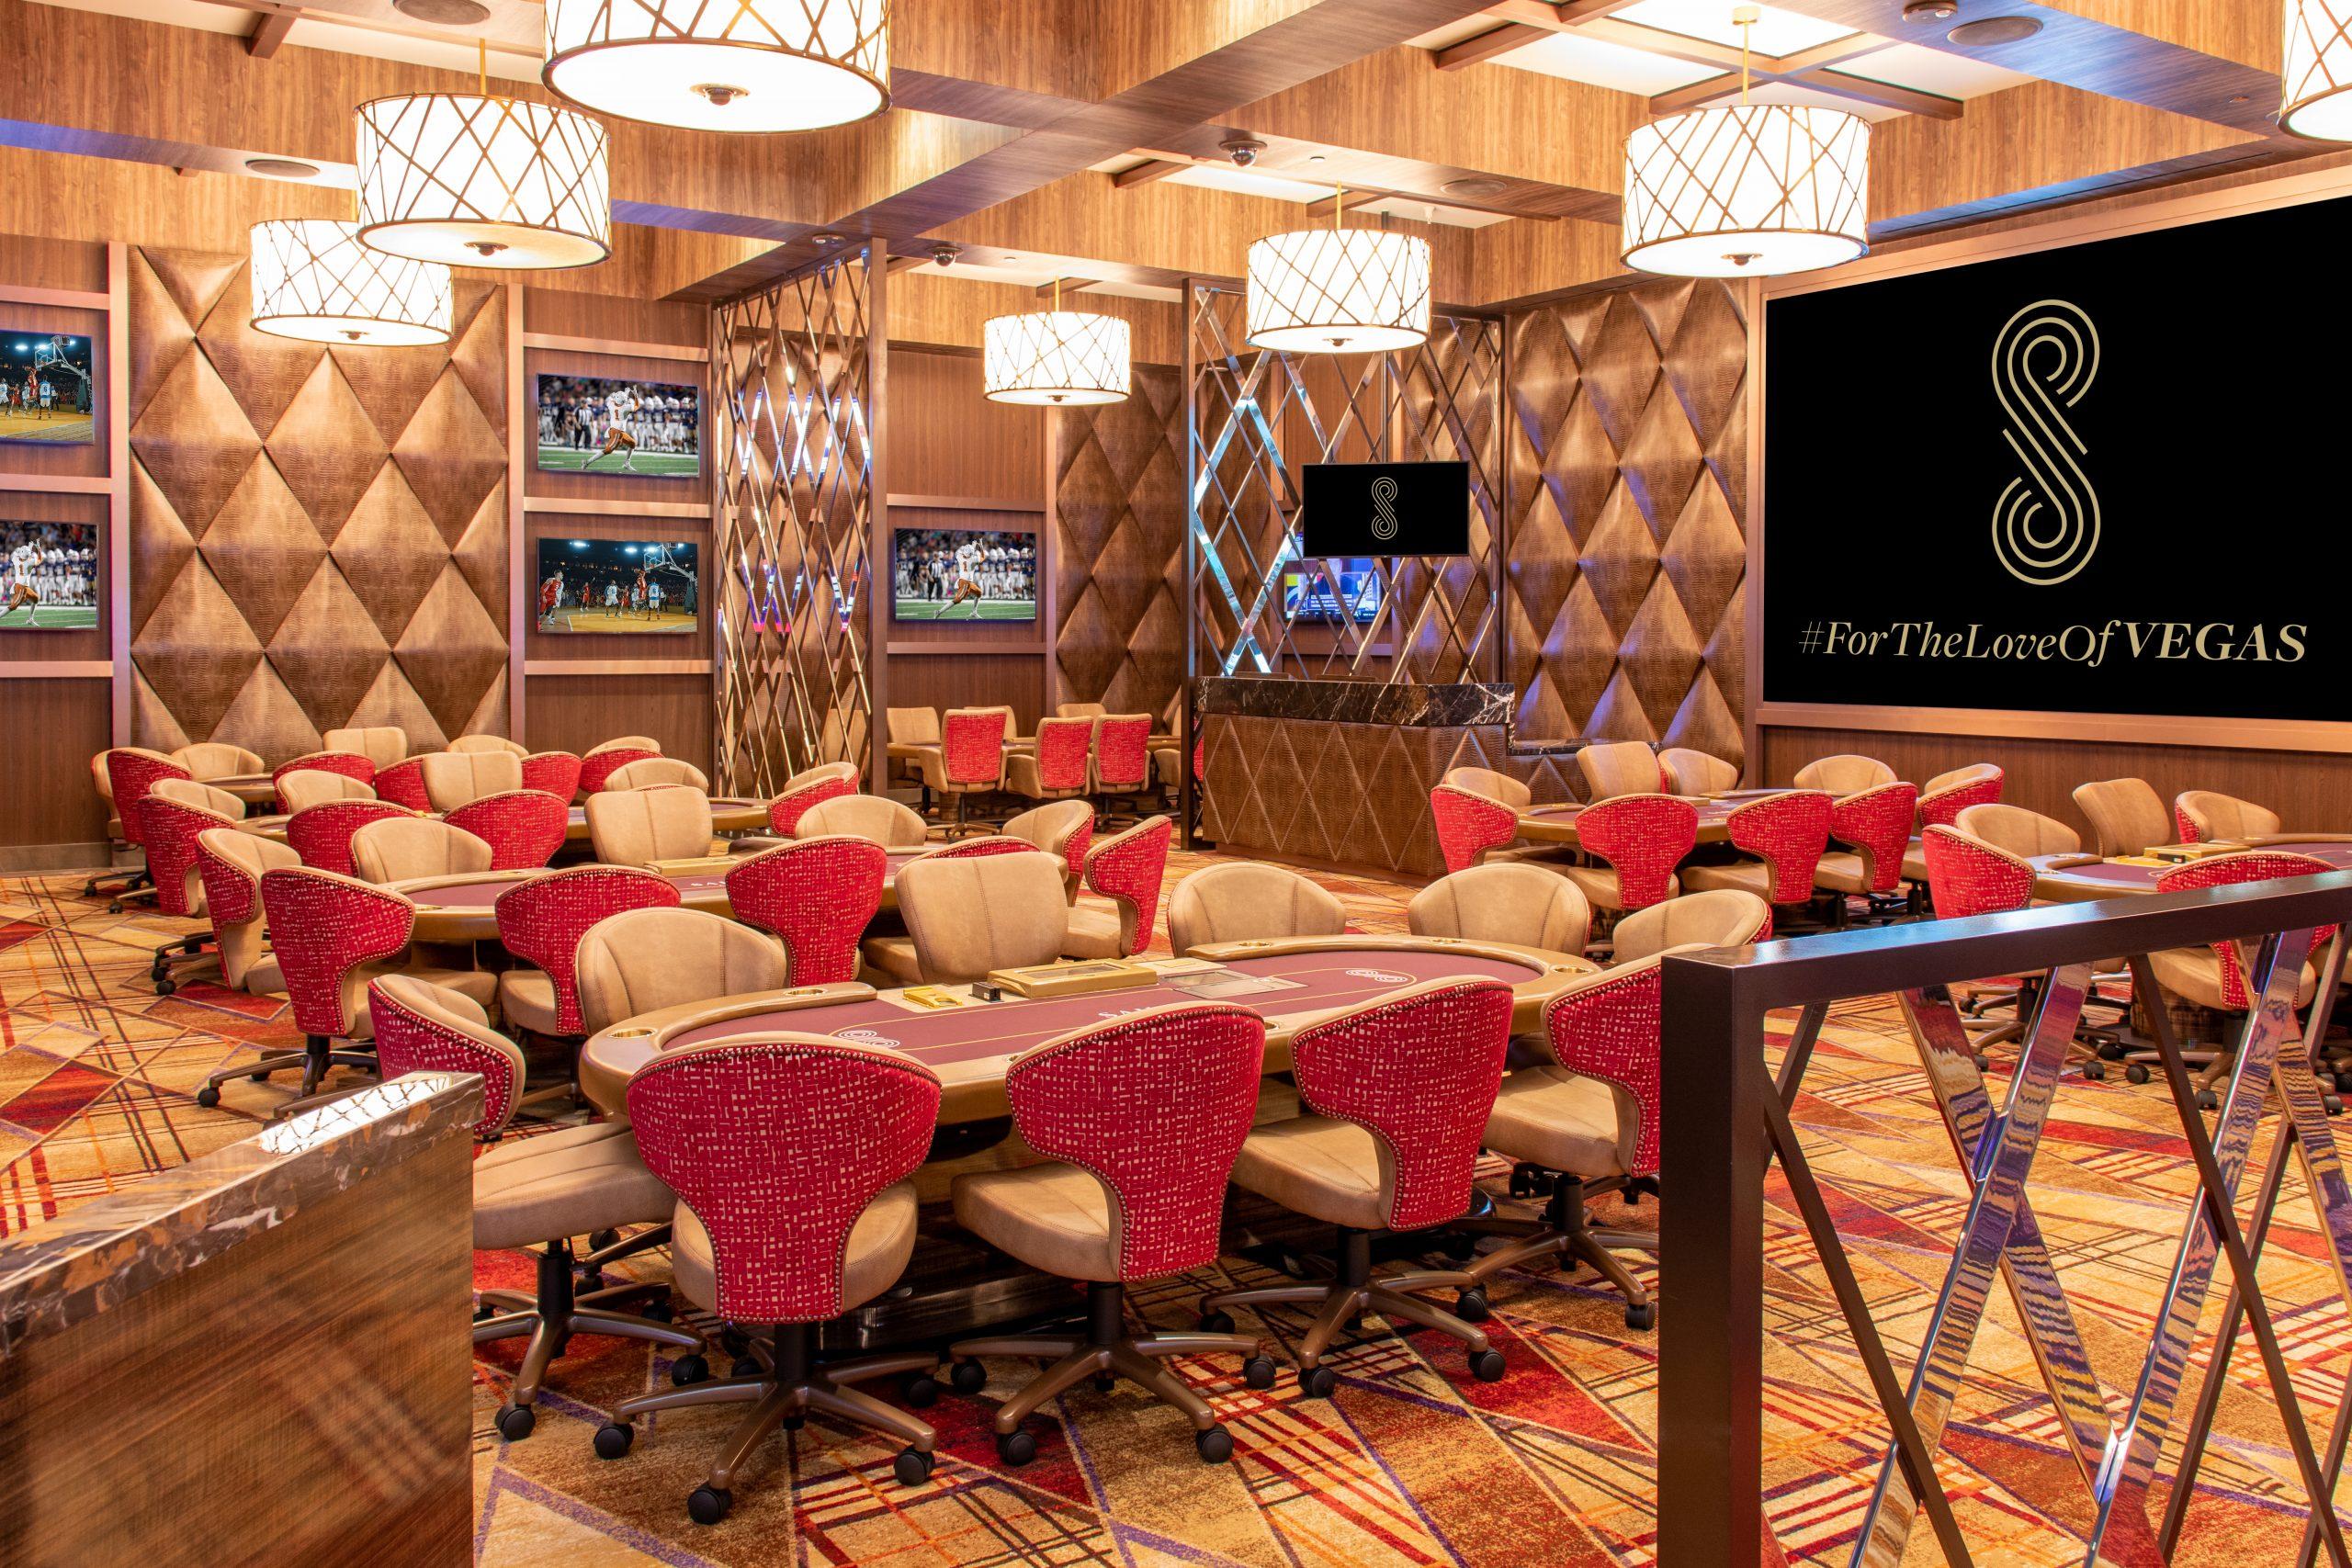 The SAHARA Las Vegas, NV